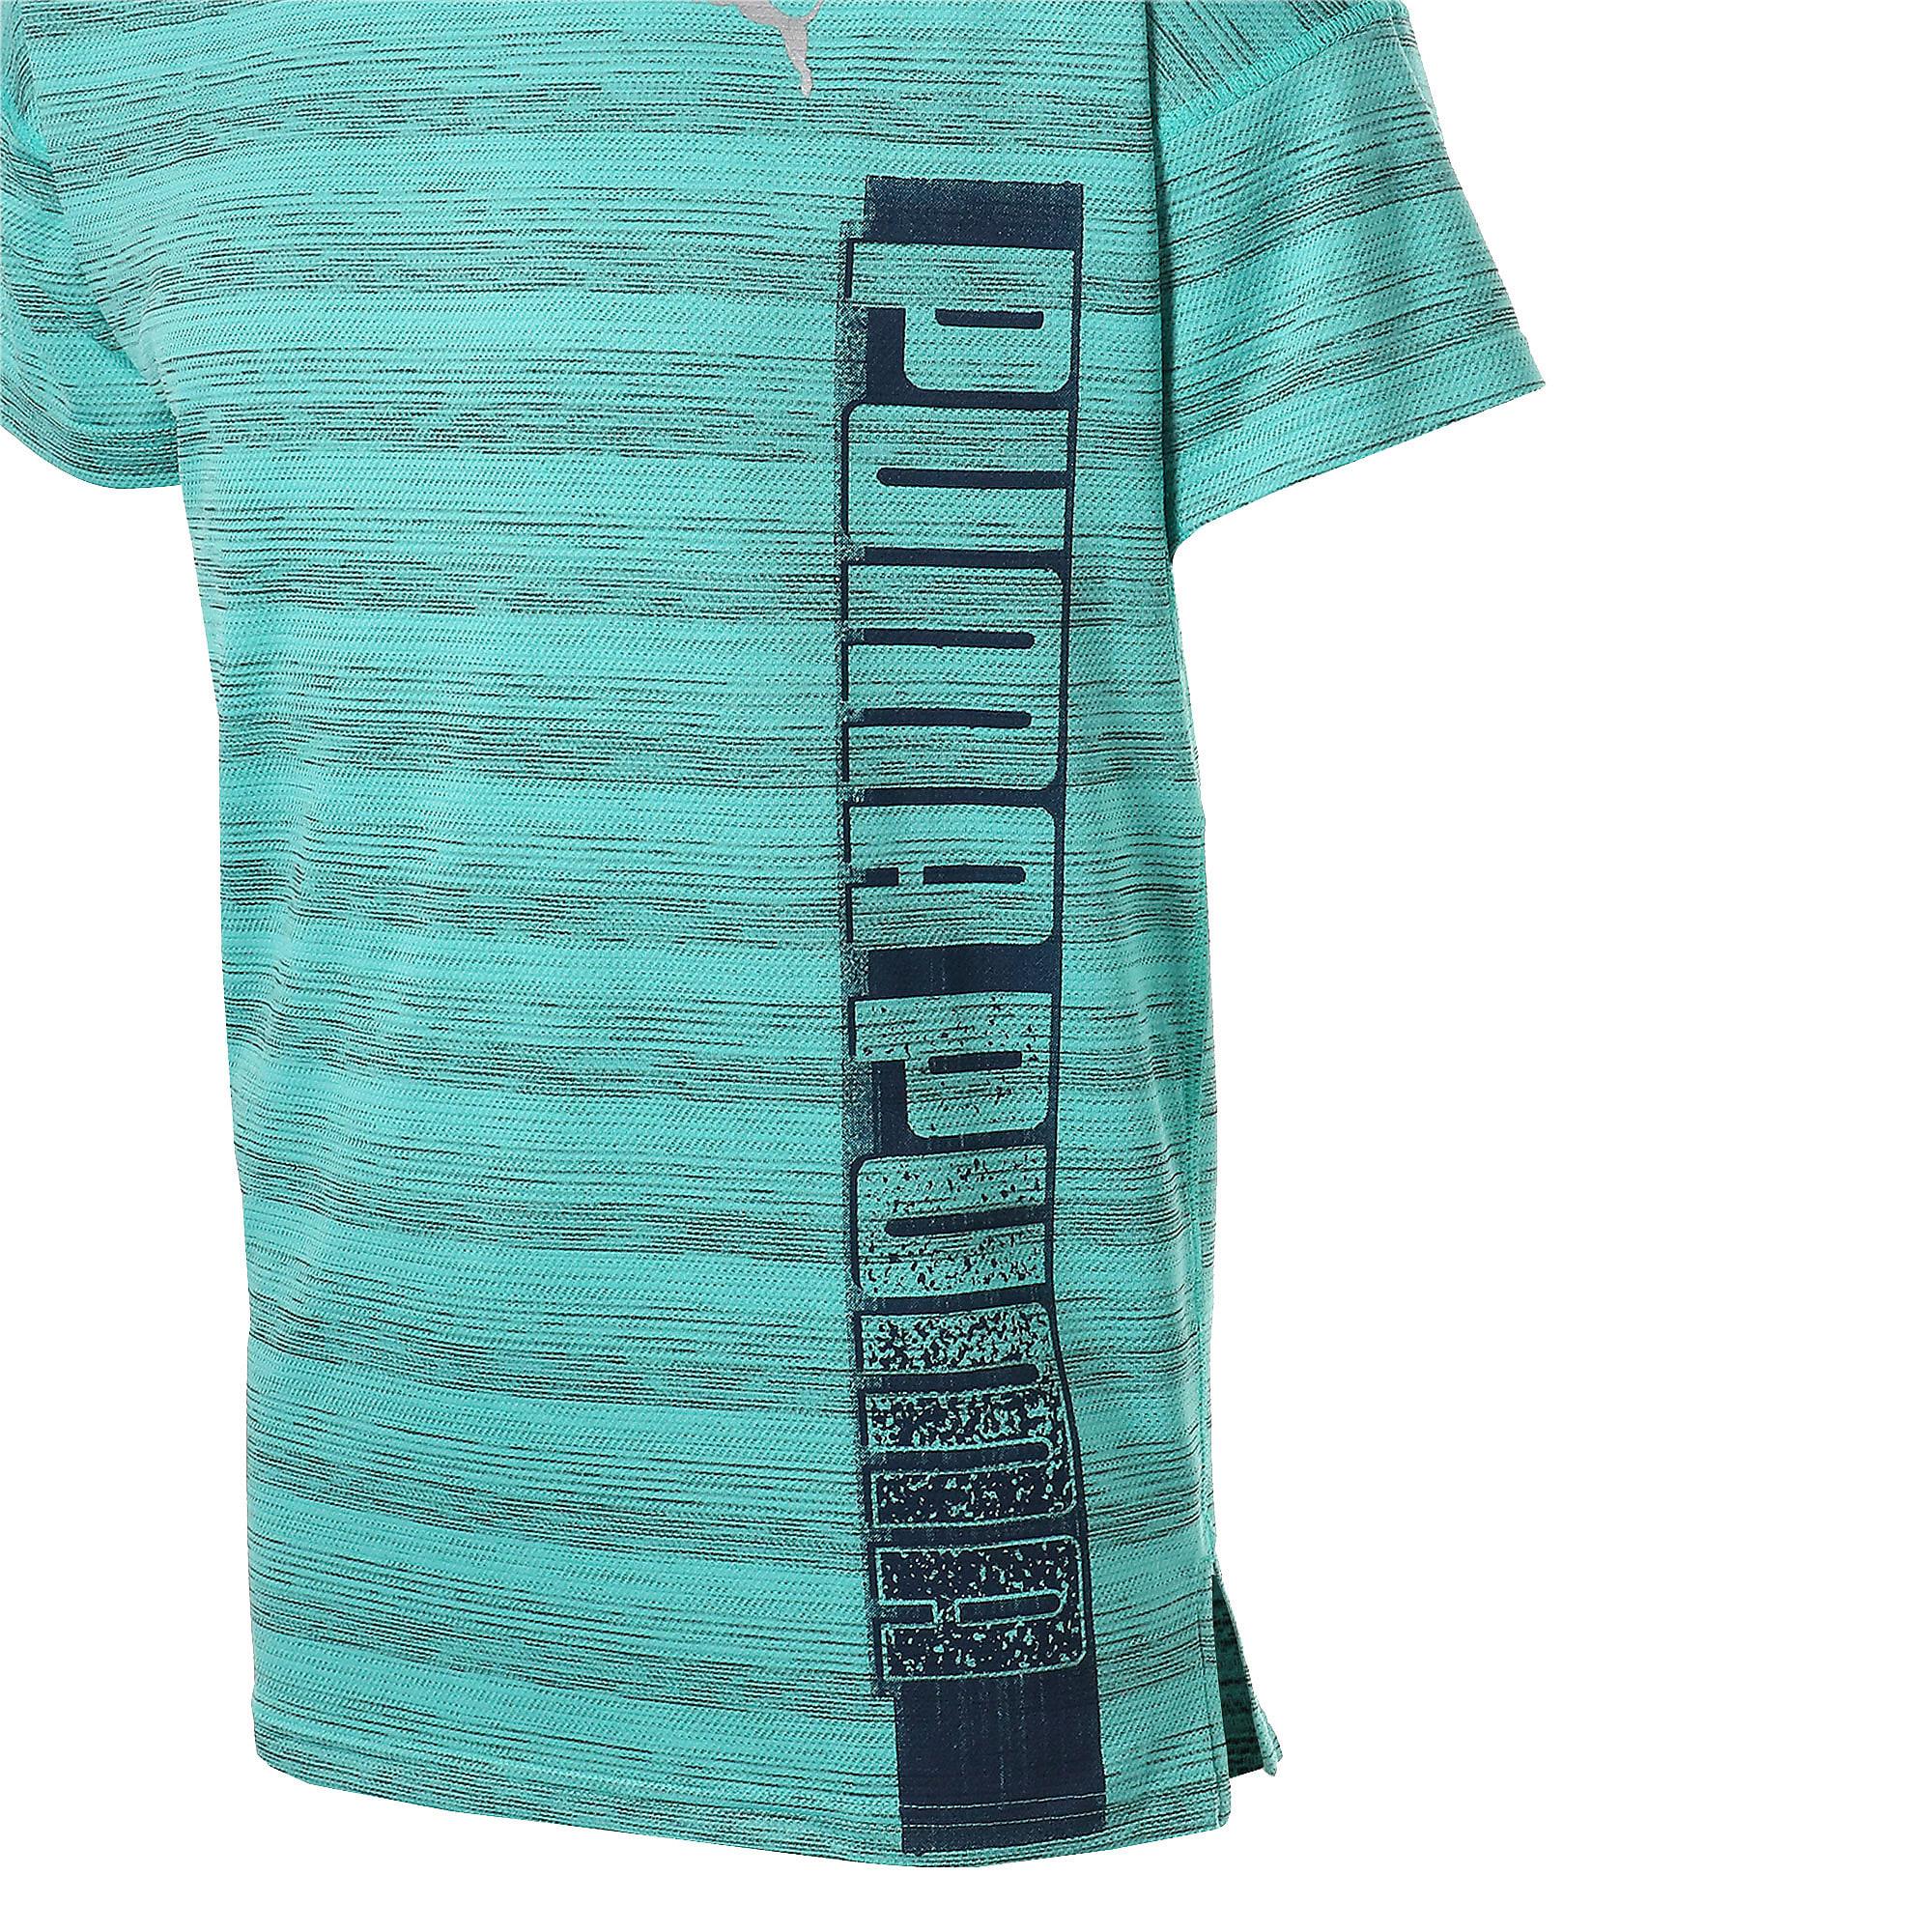 Thumbnail 10 of LAST LAP ヘザー SS ランニング Tシャツ 半袖, Blue Turquoise Heather, medium-JPN